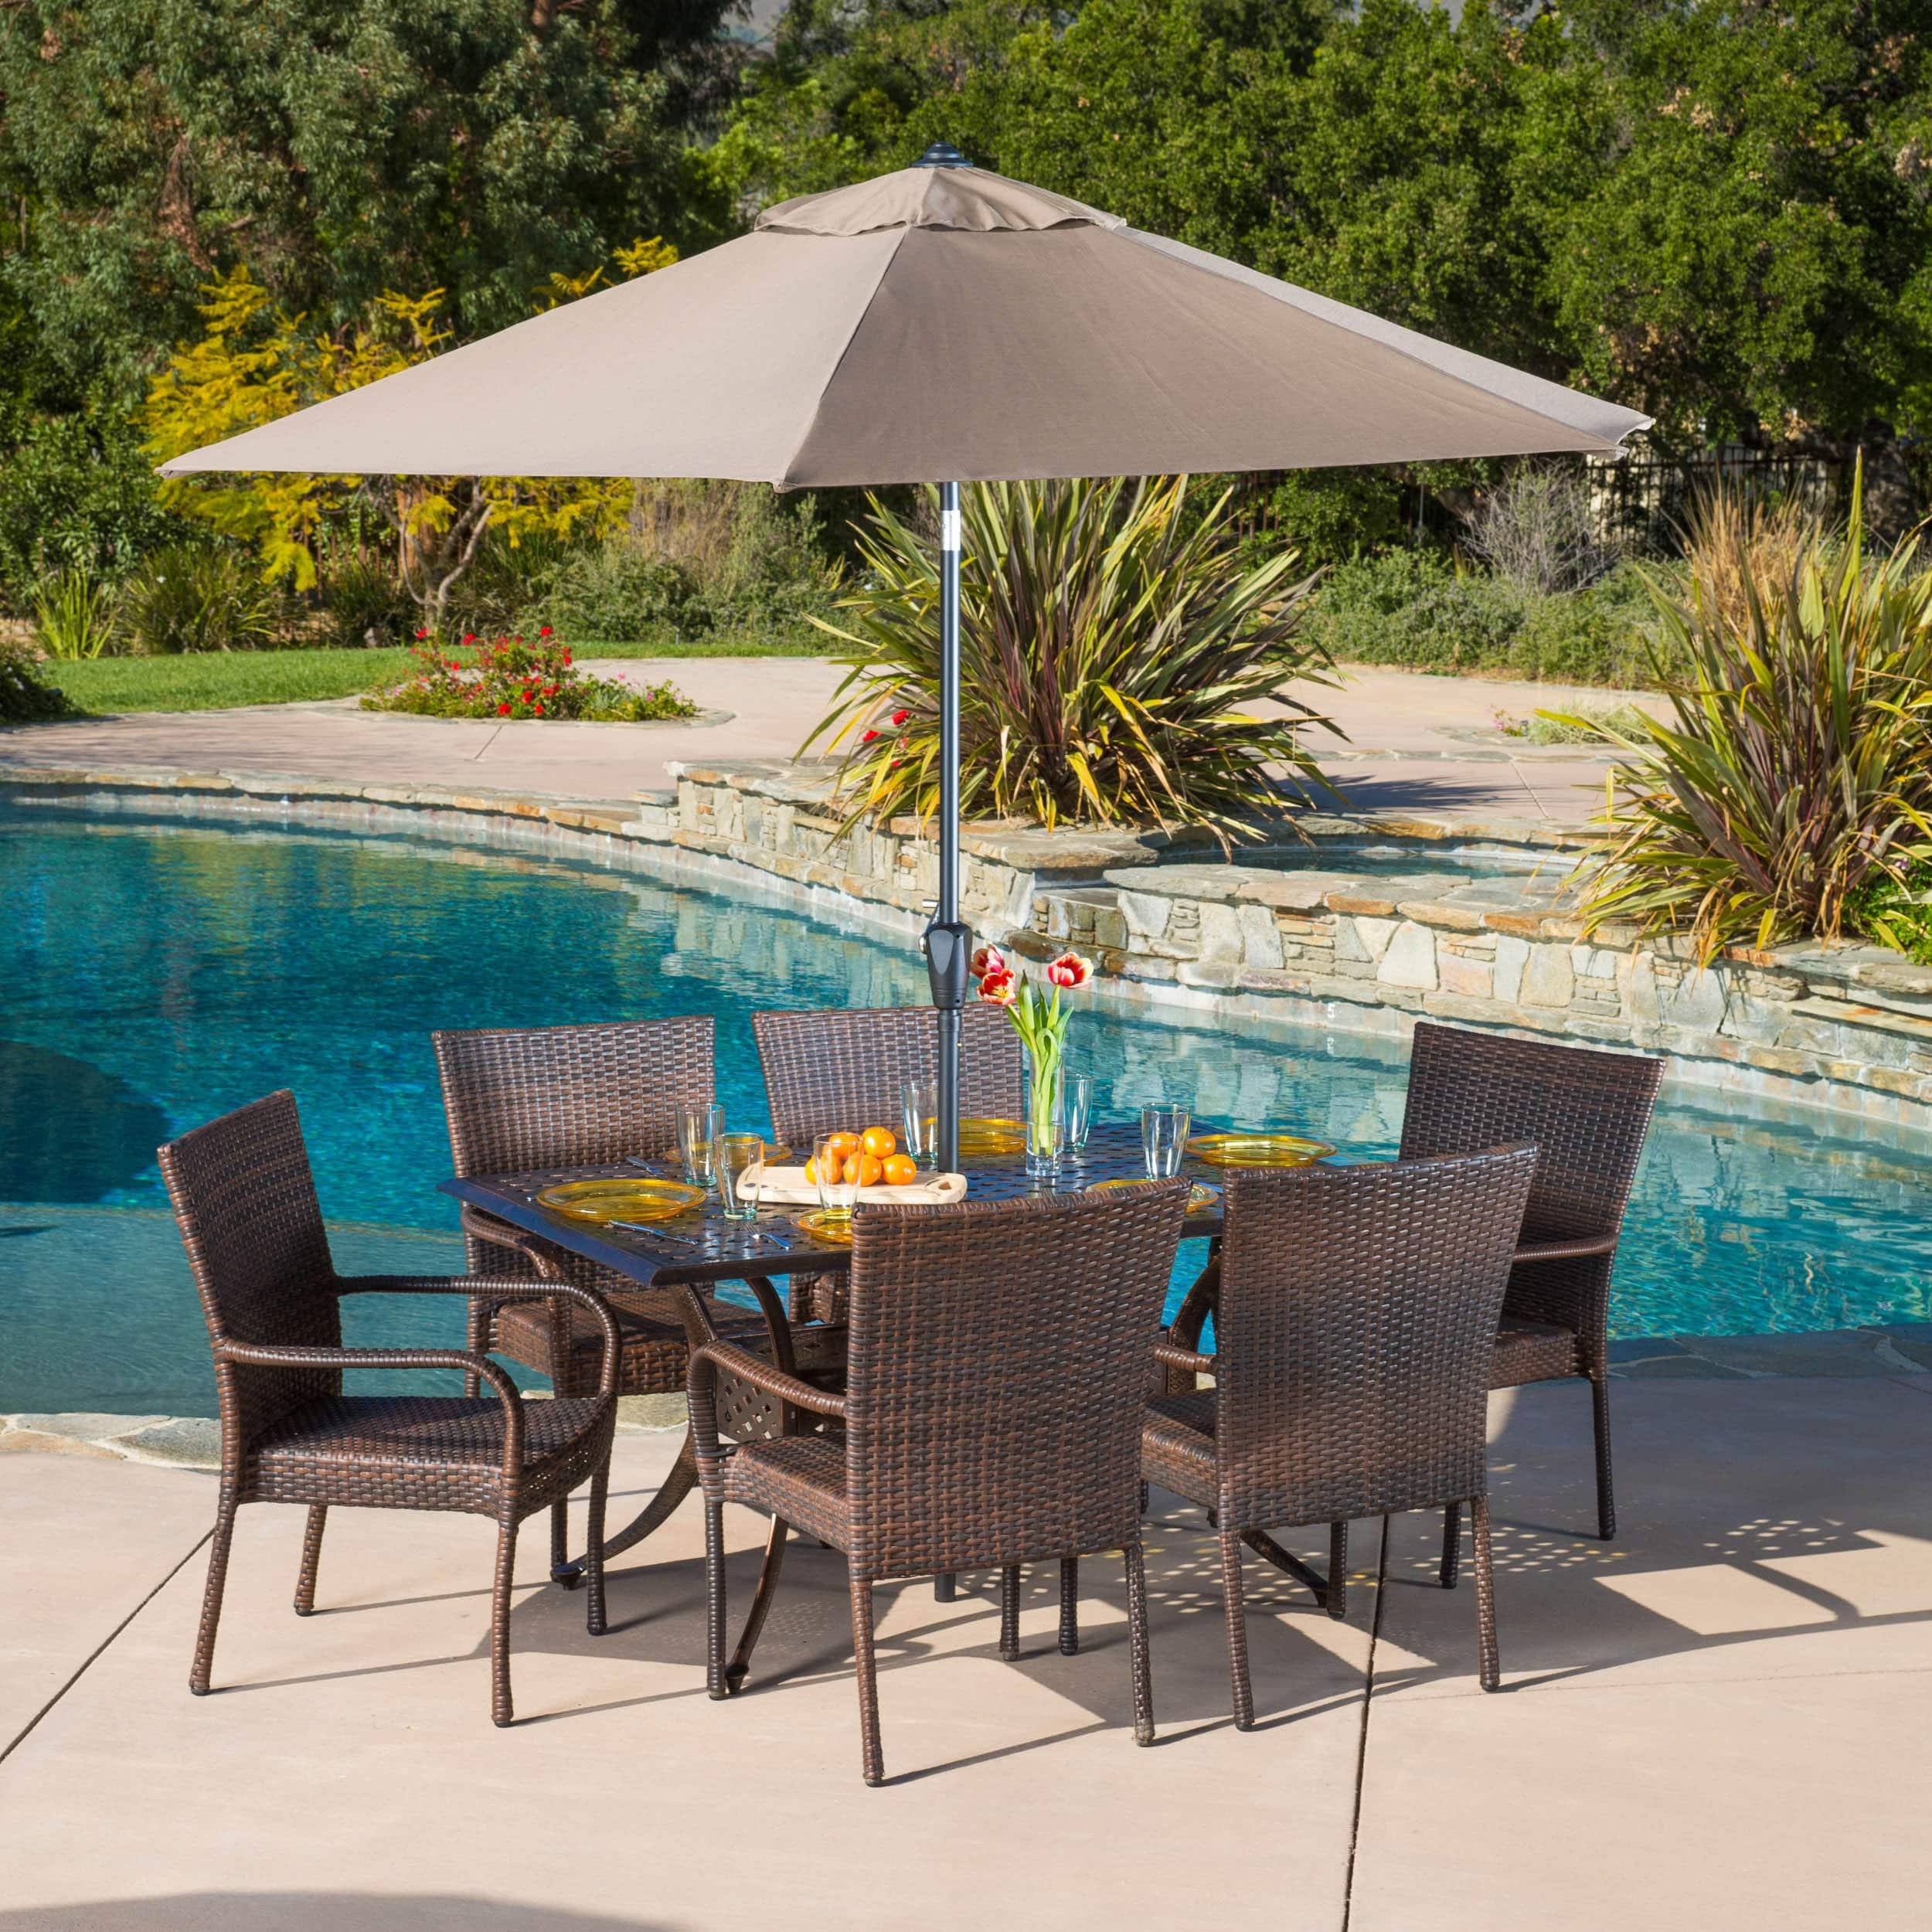 Best Furniture Deals Online: Buy Outdoor Dining Sets Online At Overstock.com